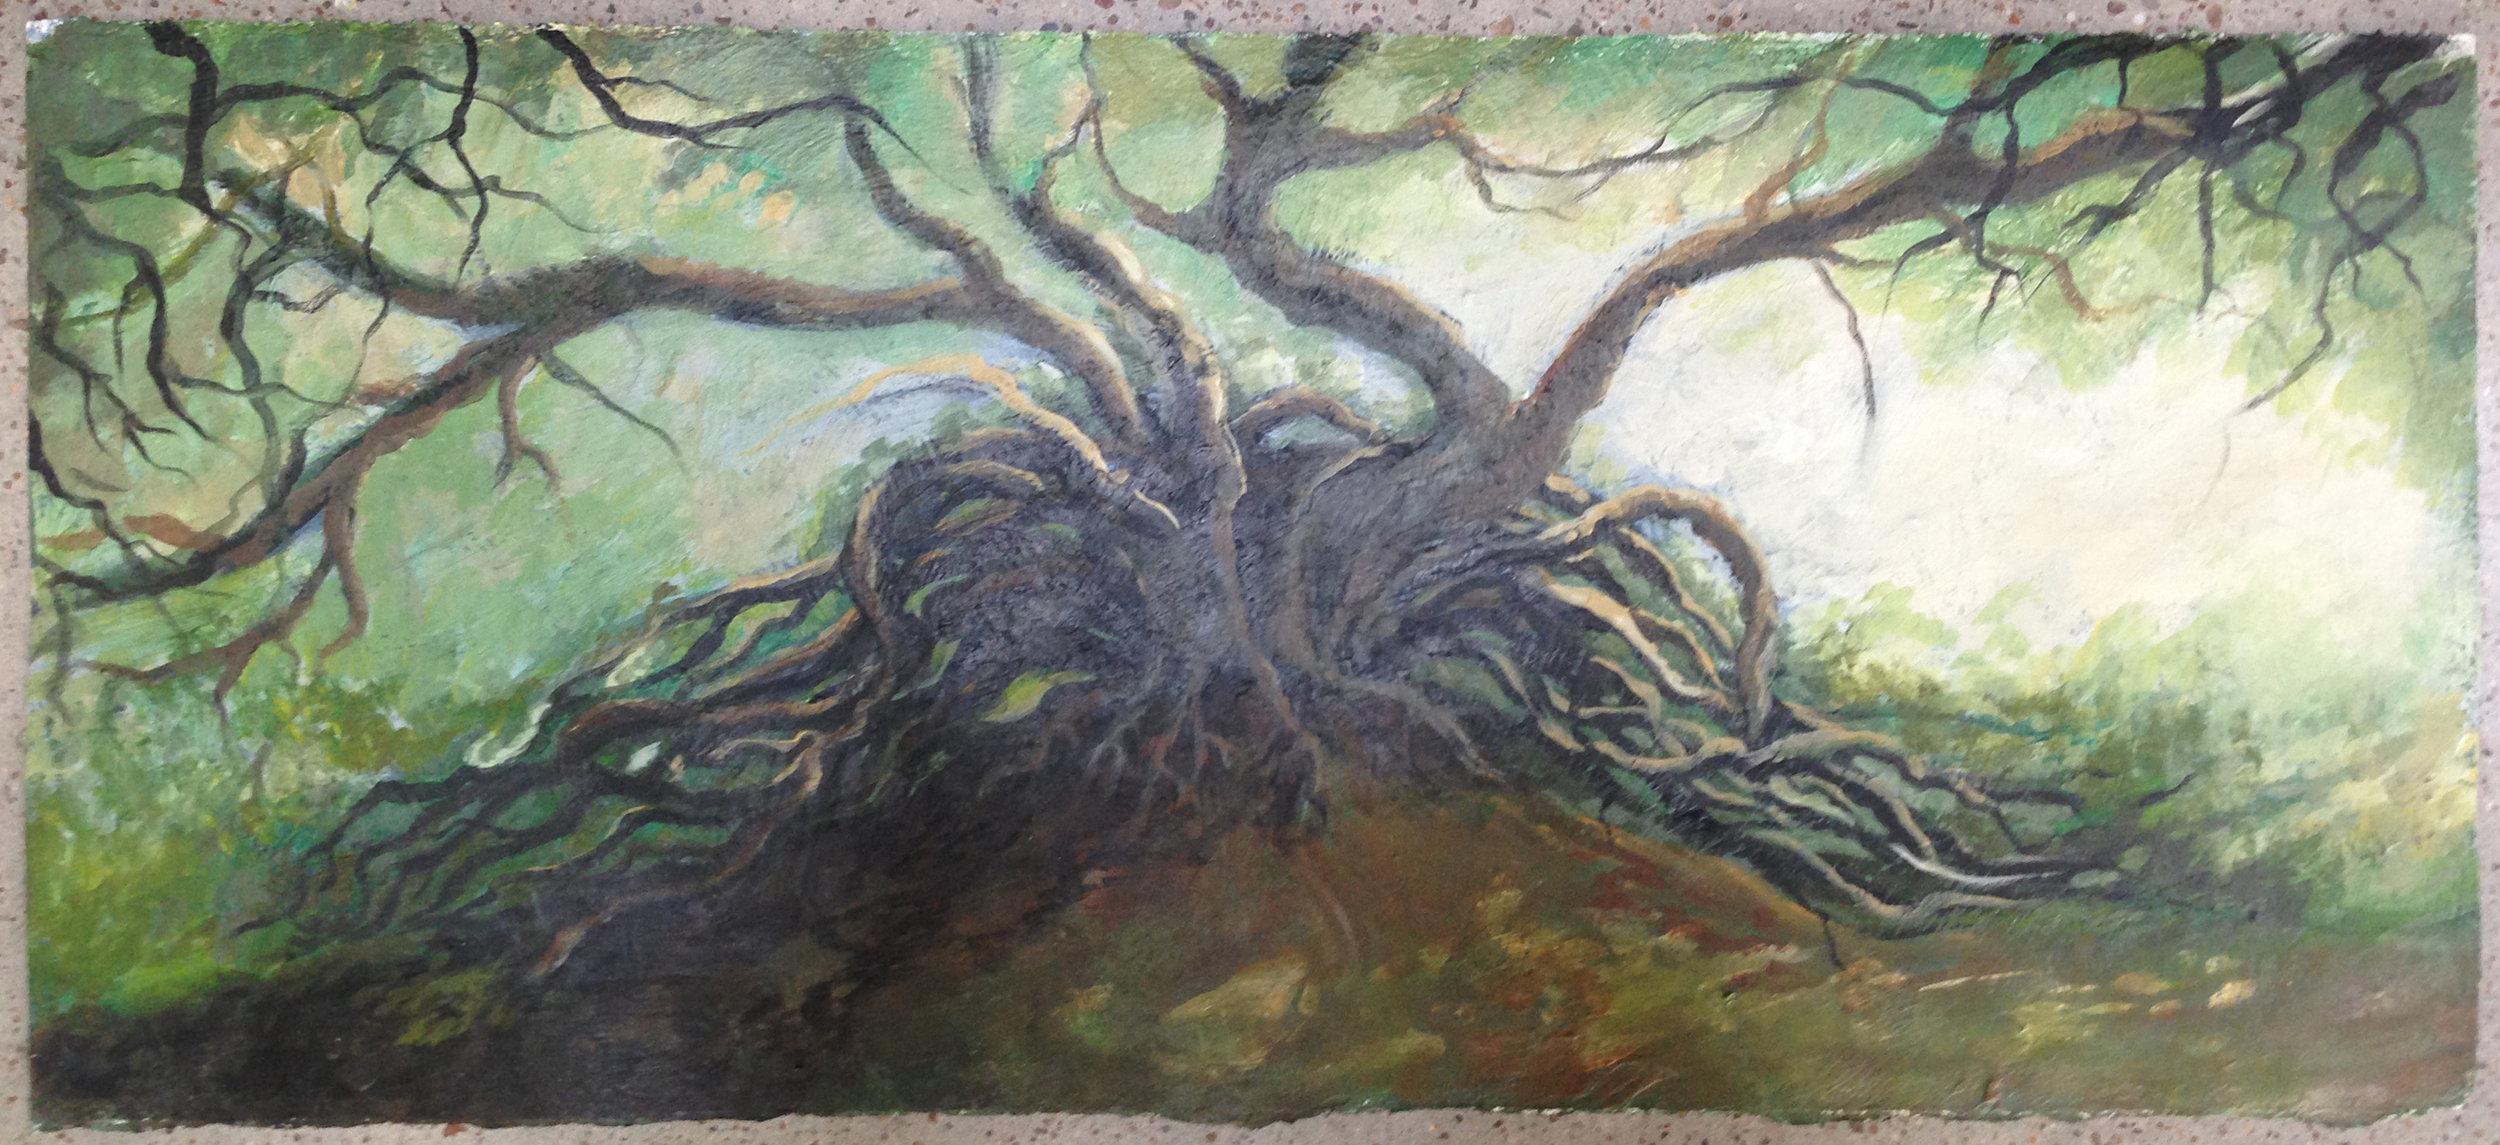 Tree Yew, 2006